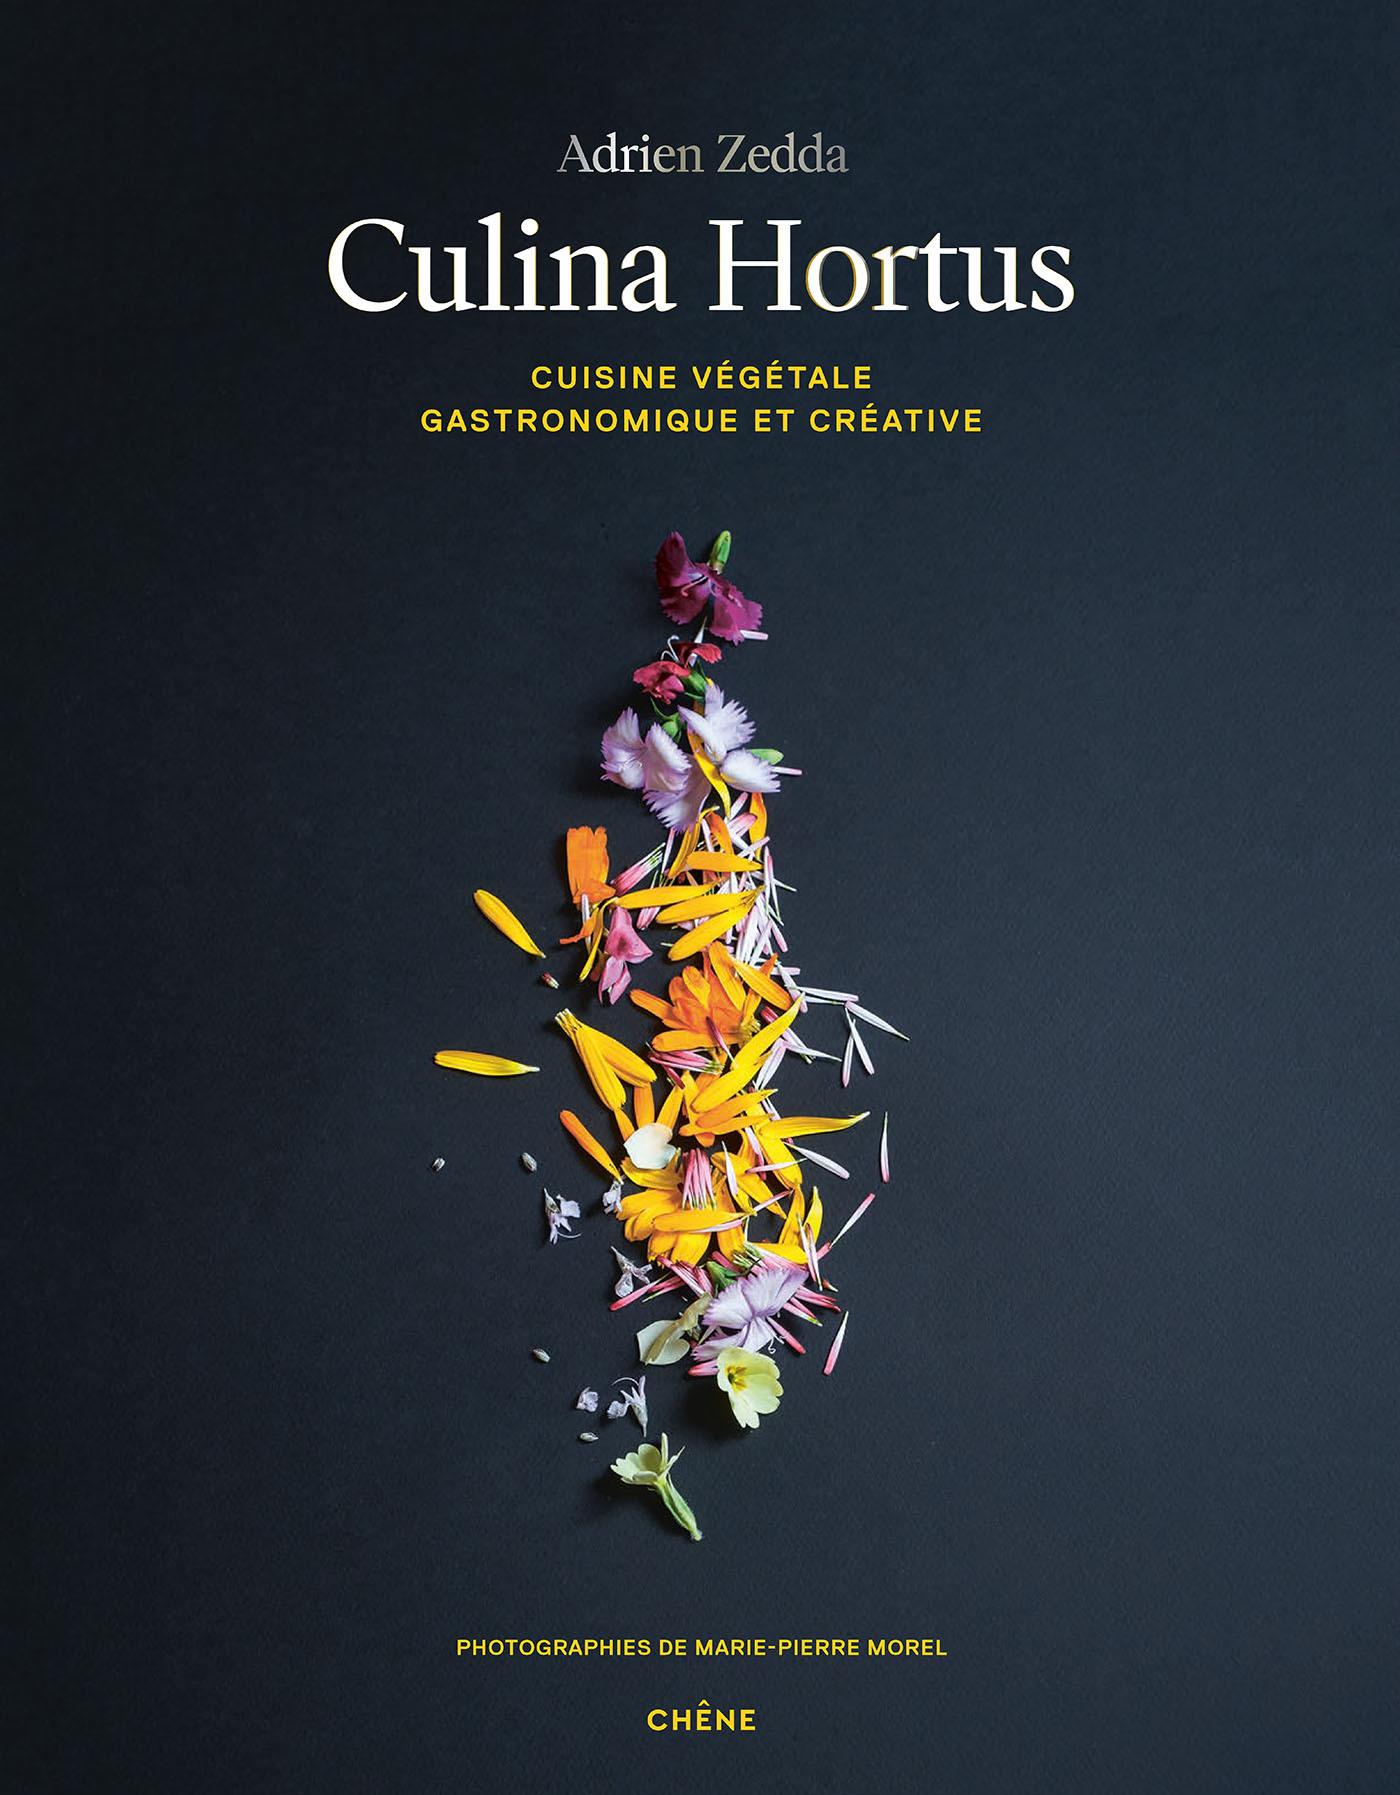 CULINA HORTUS - CUISINE VEGETALE GASTRONOMIQUE ET CREATIVE